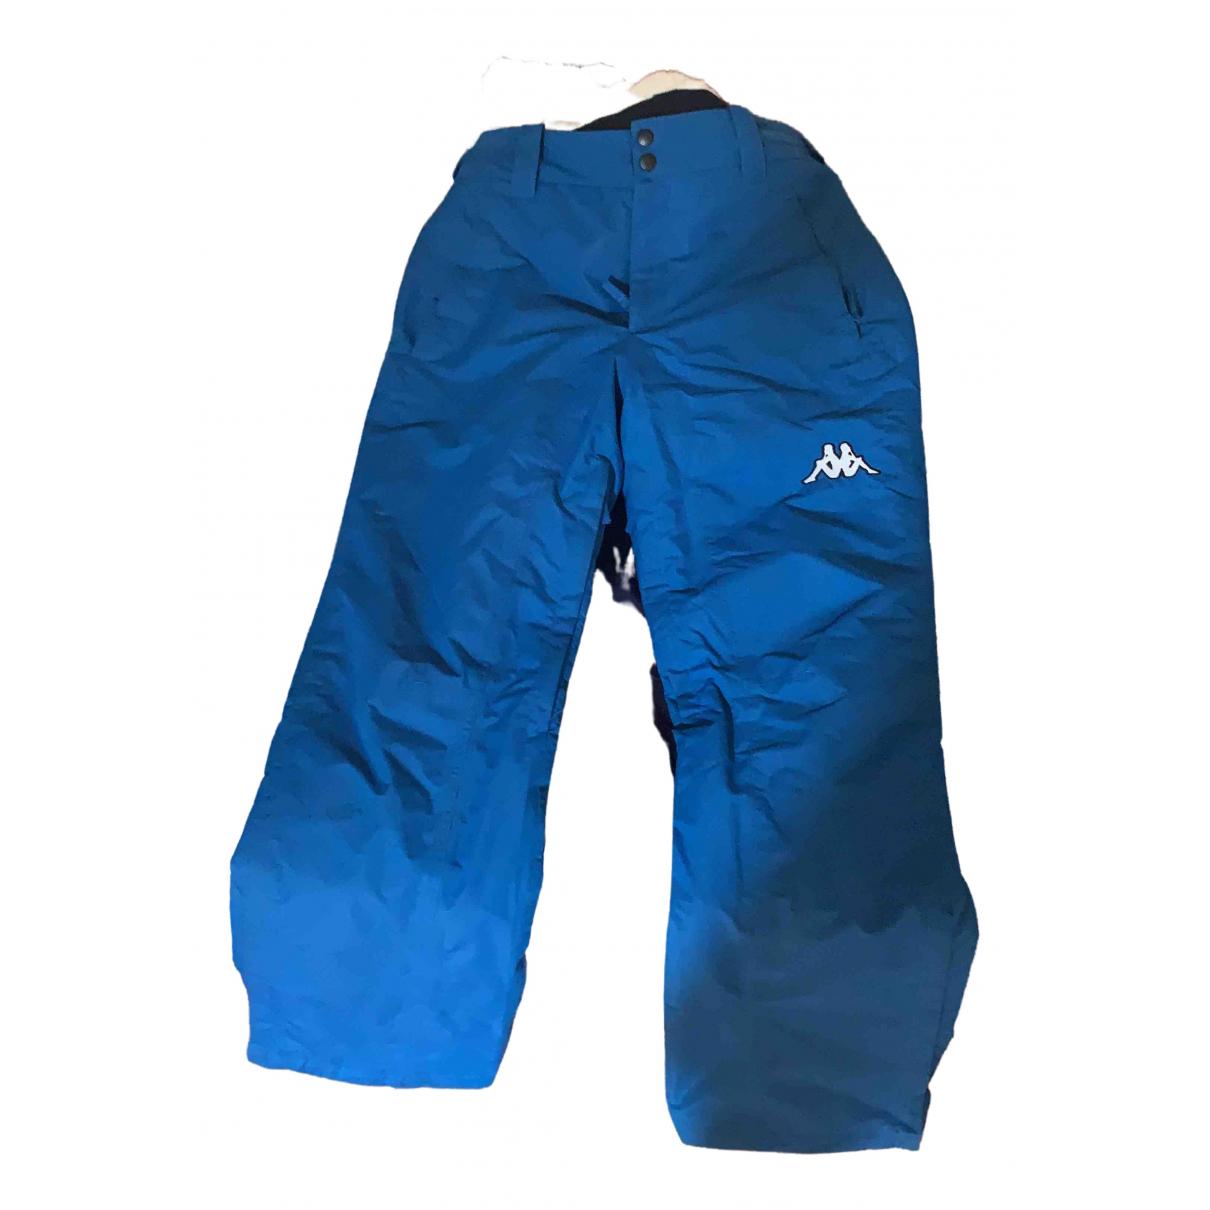 Kappa \N Blue Trousers for Men M International